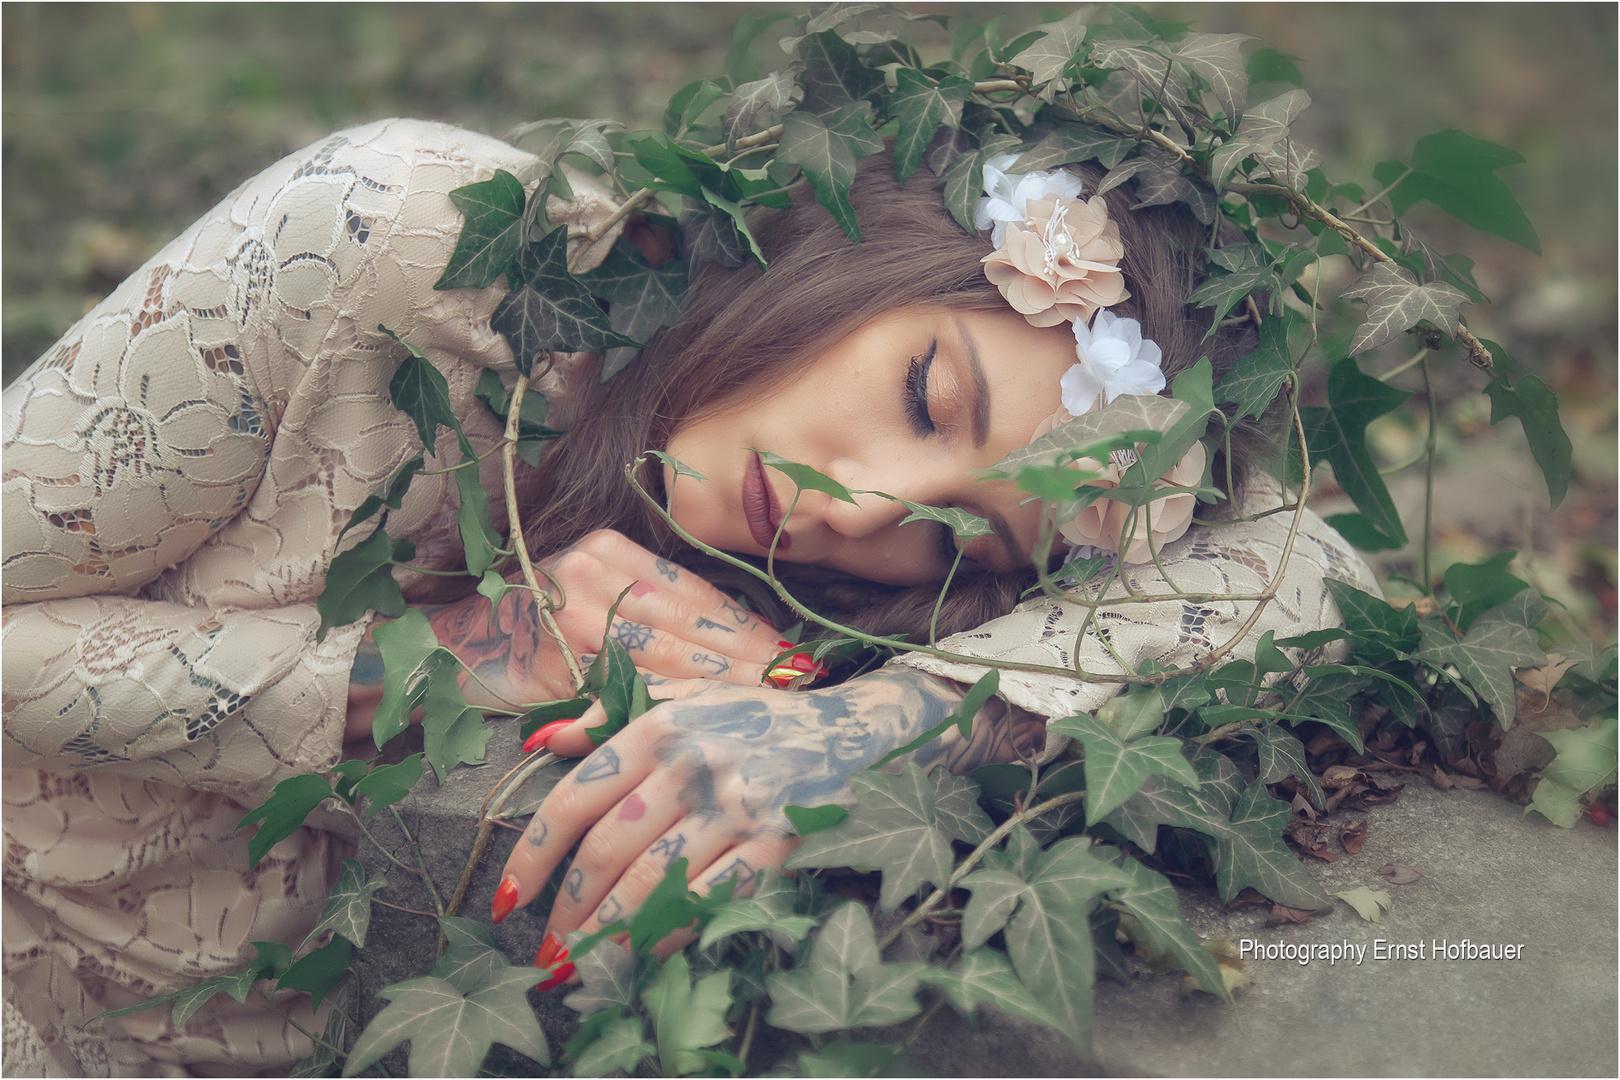 Sleeping Innocence